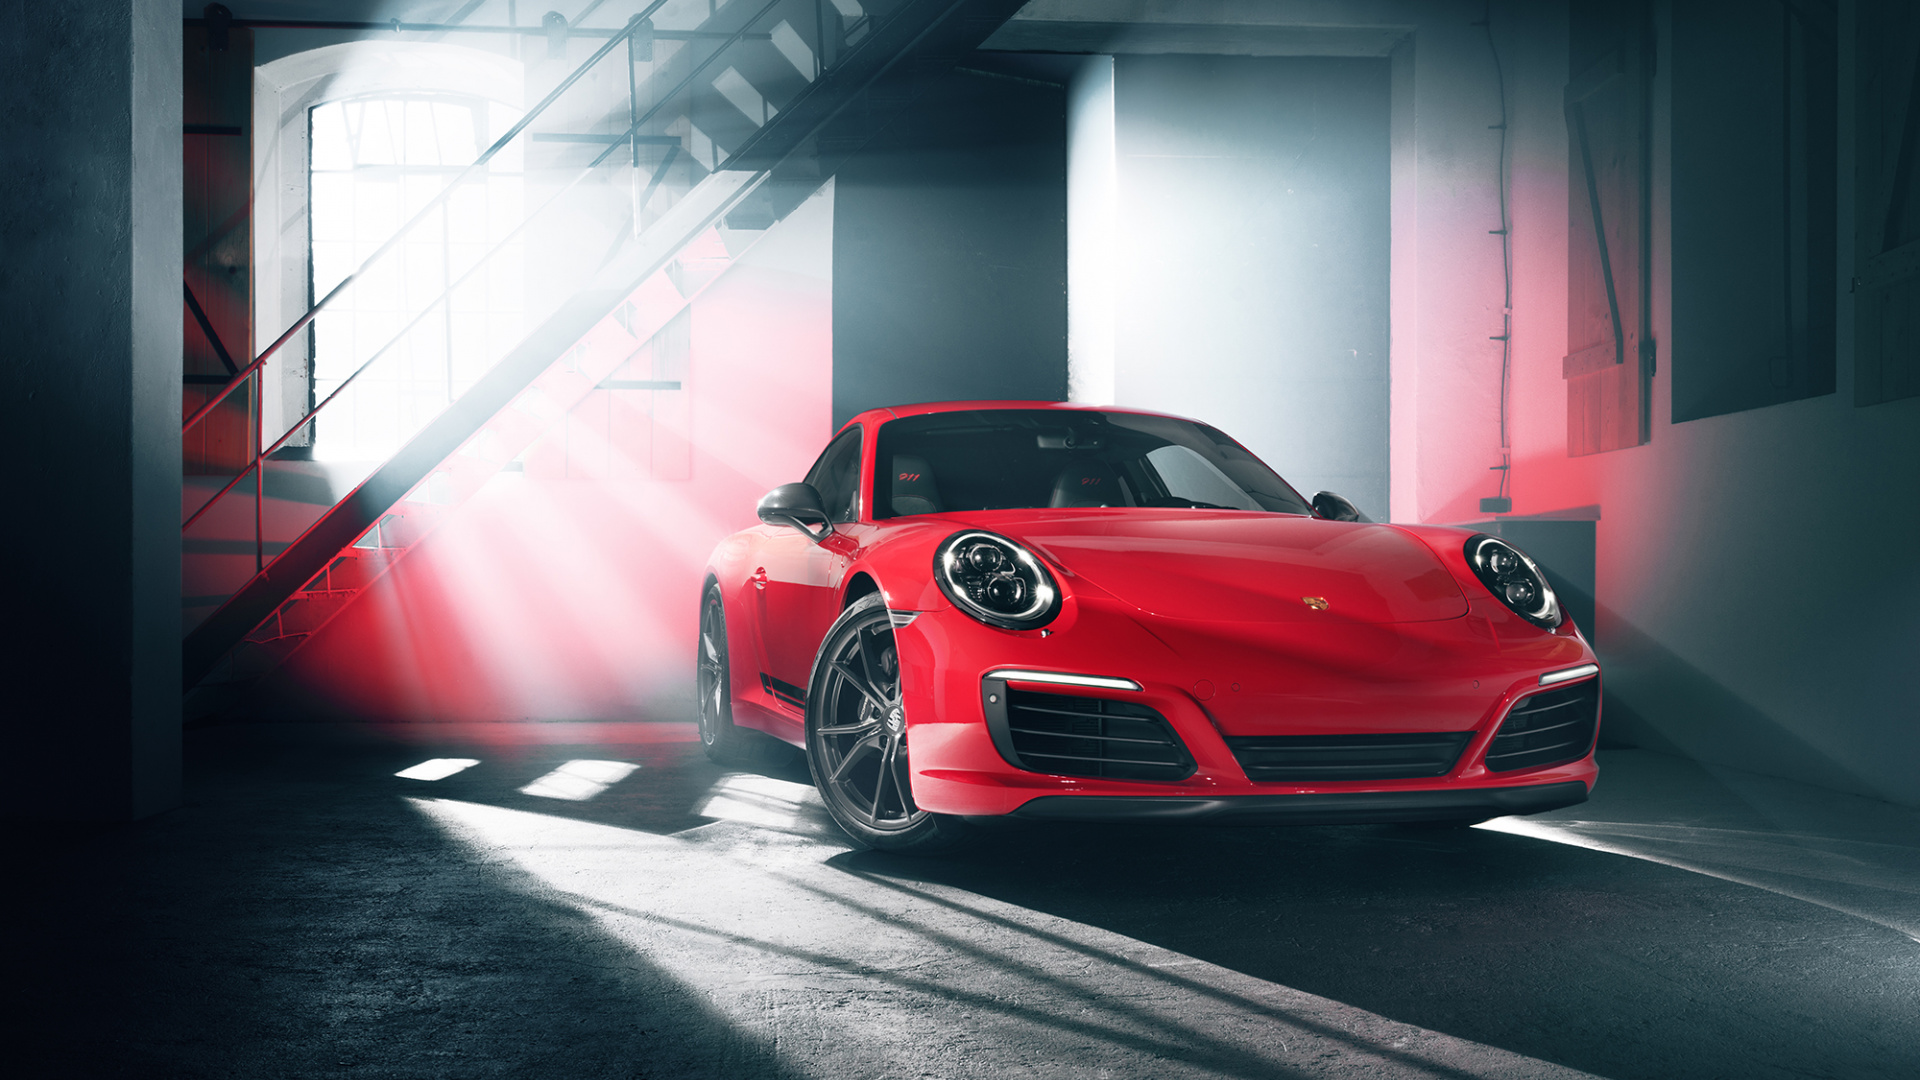 Porsche 911 Carrera S Red 1920x1080 Wallpaper Teahub Io